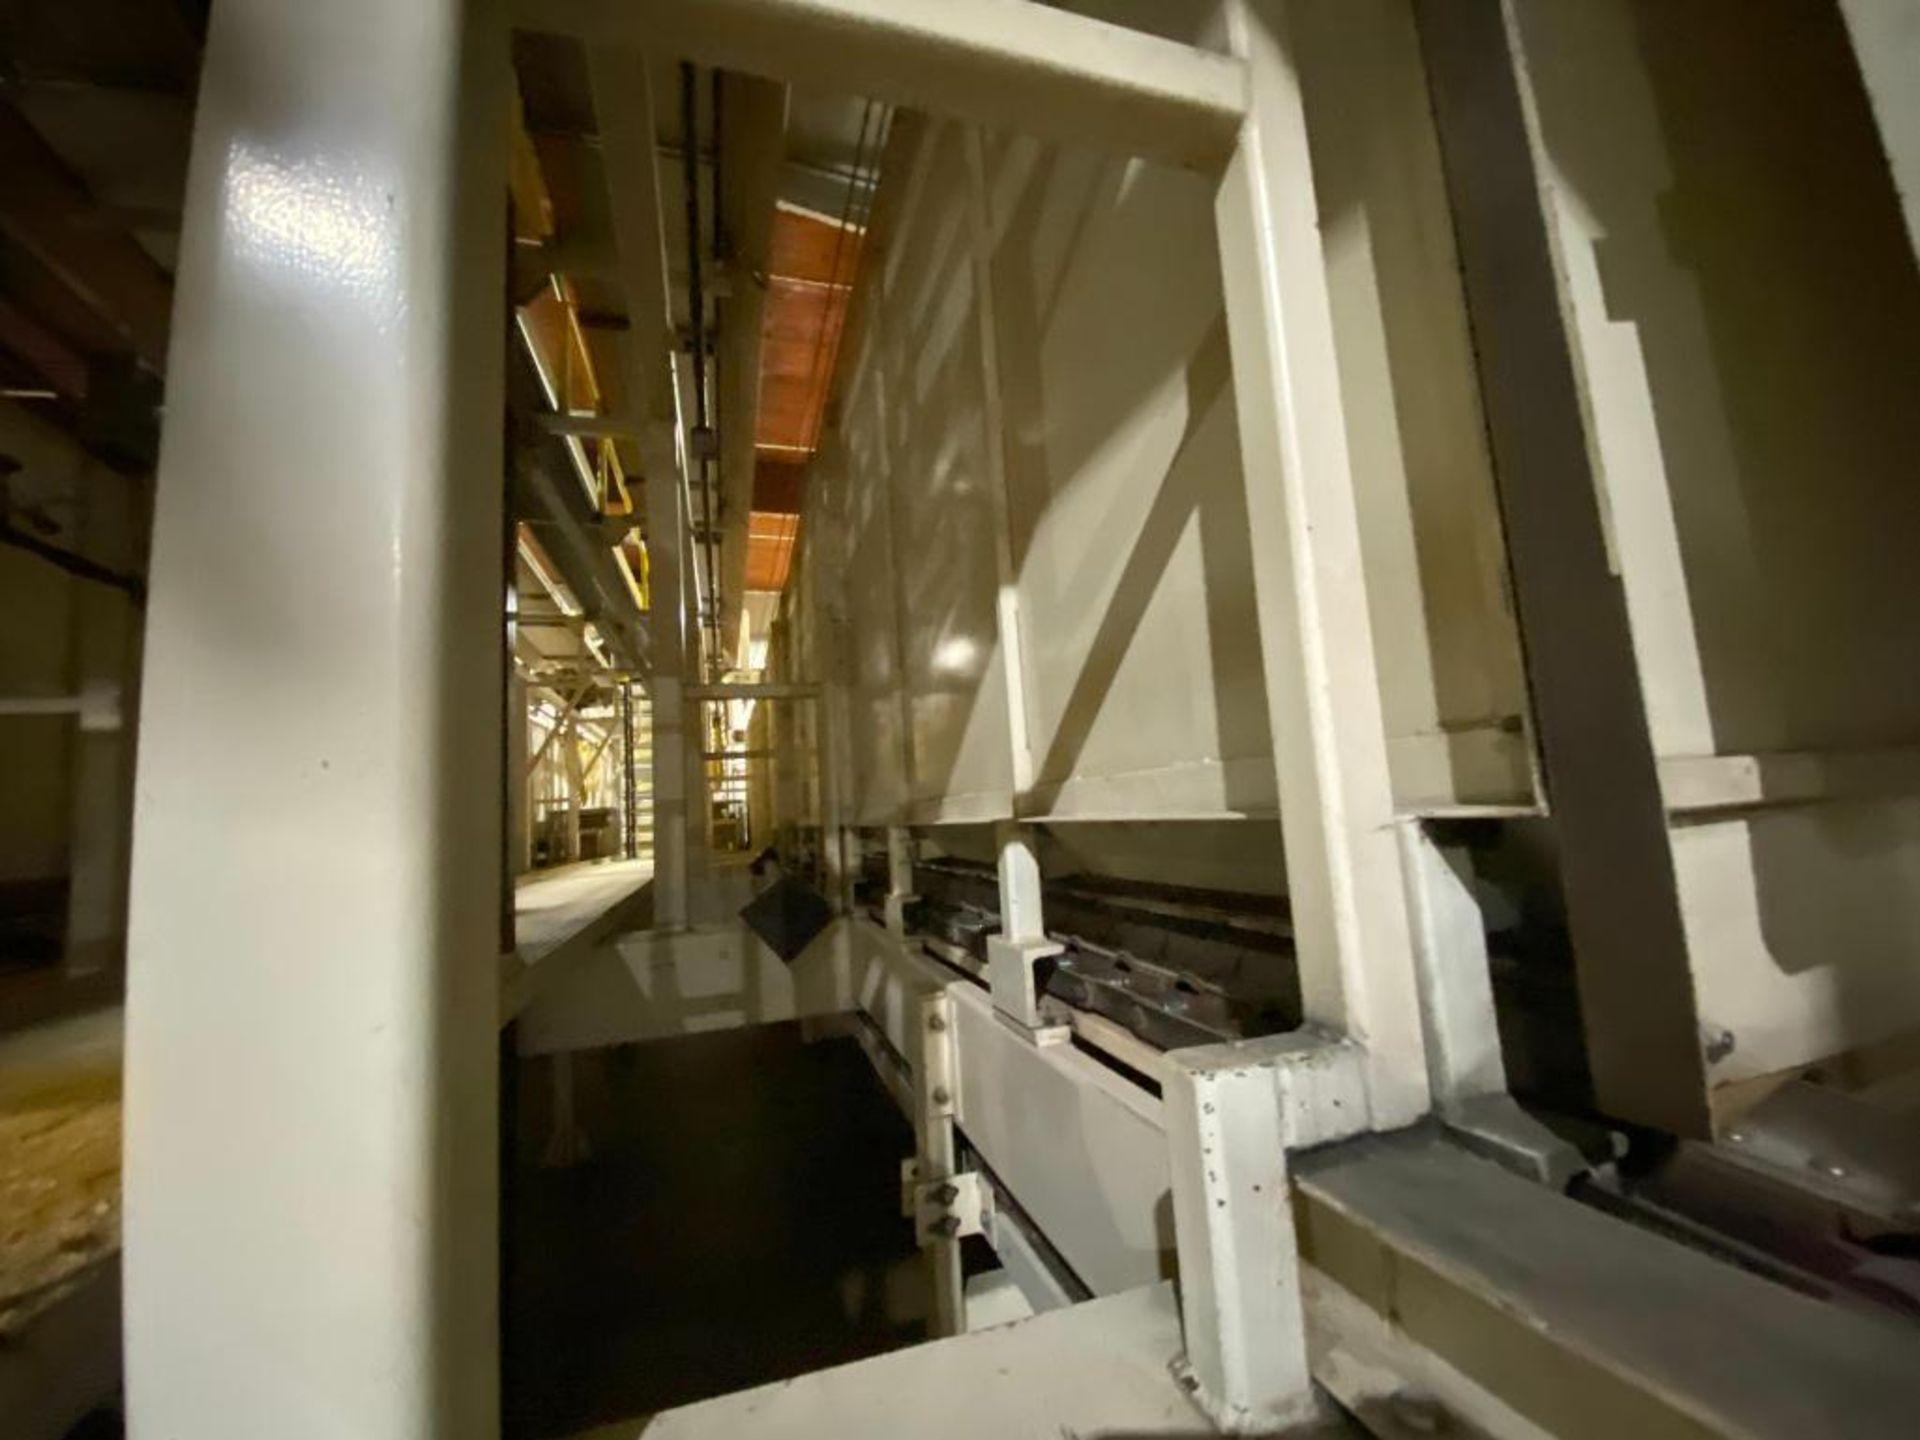 Aseeco bulk accumulation bin - Image 5 of 13